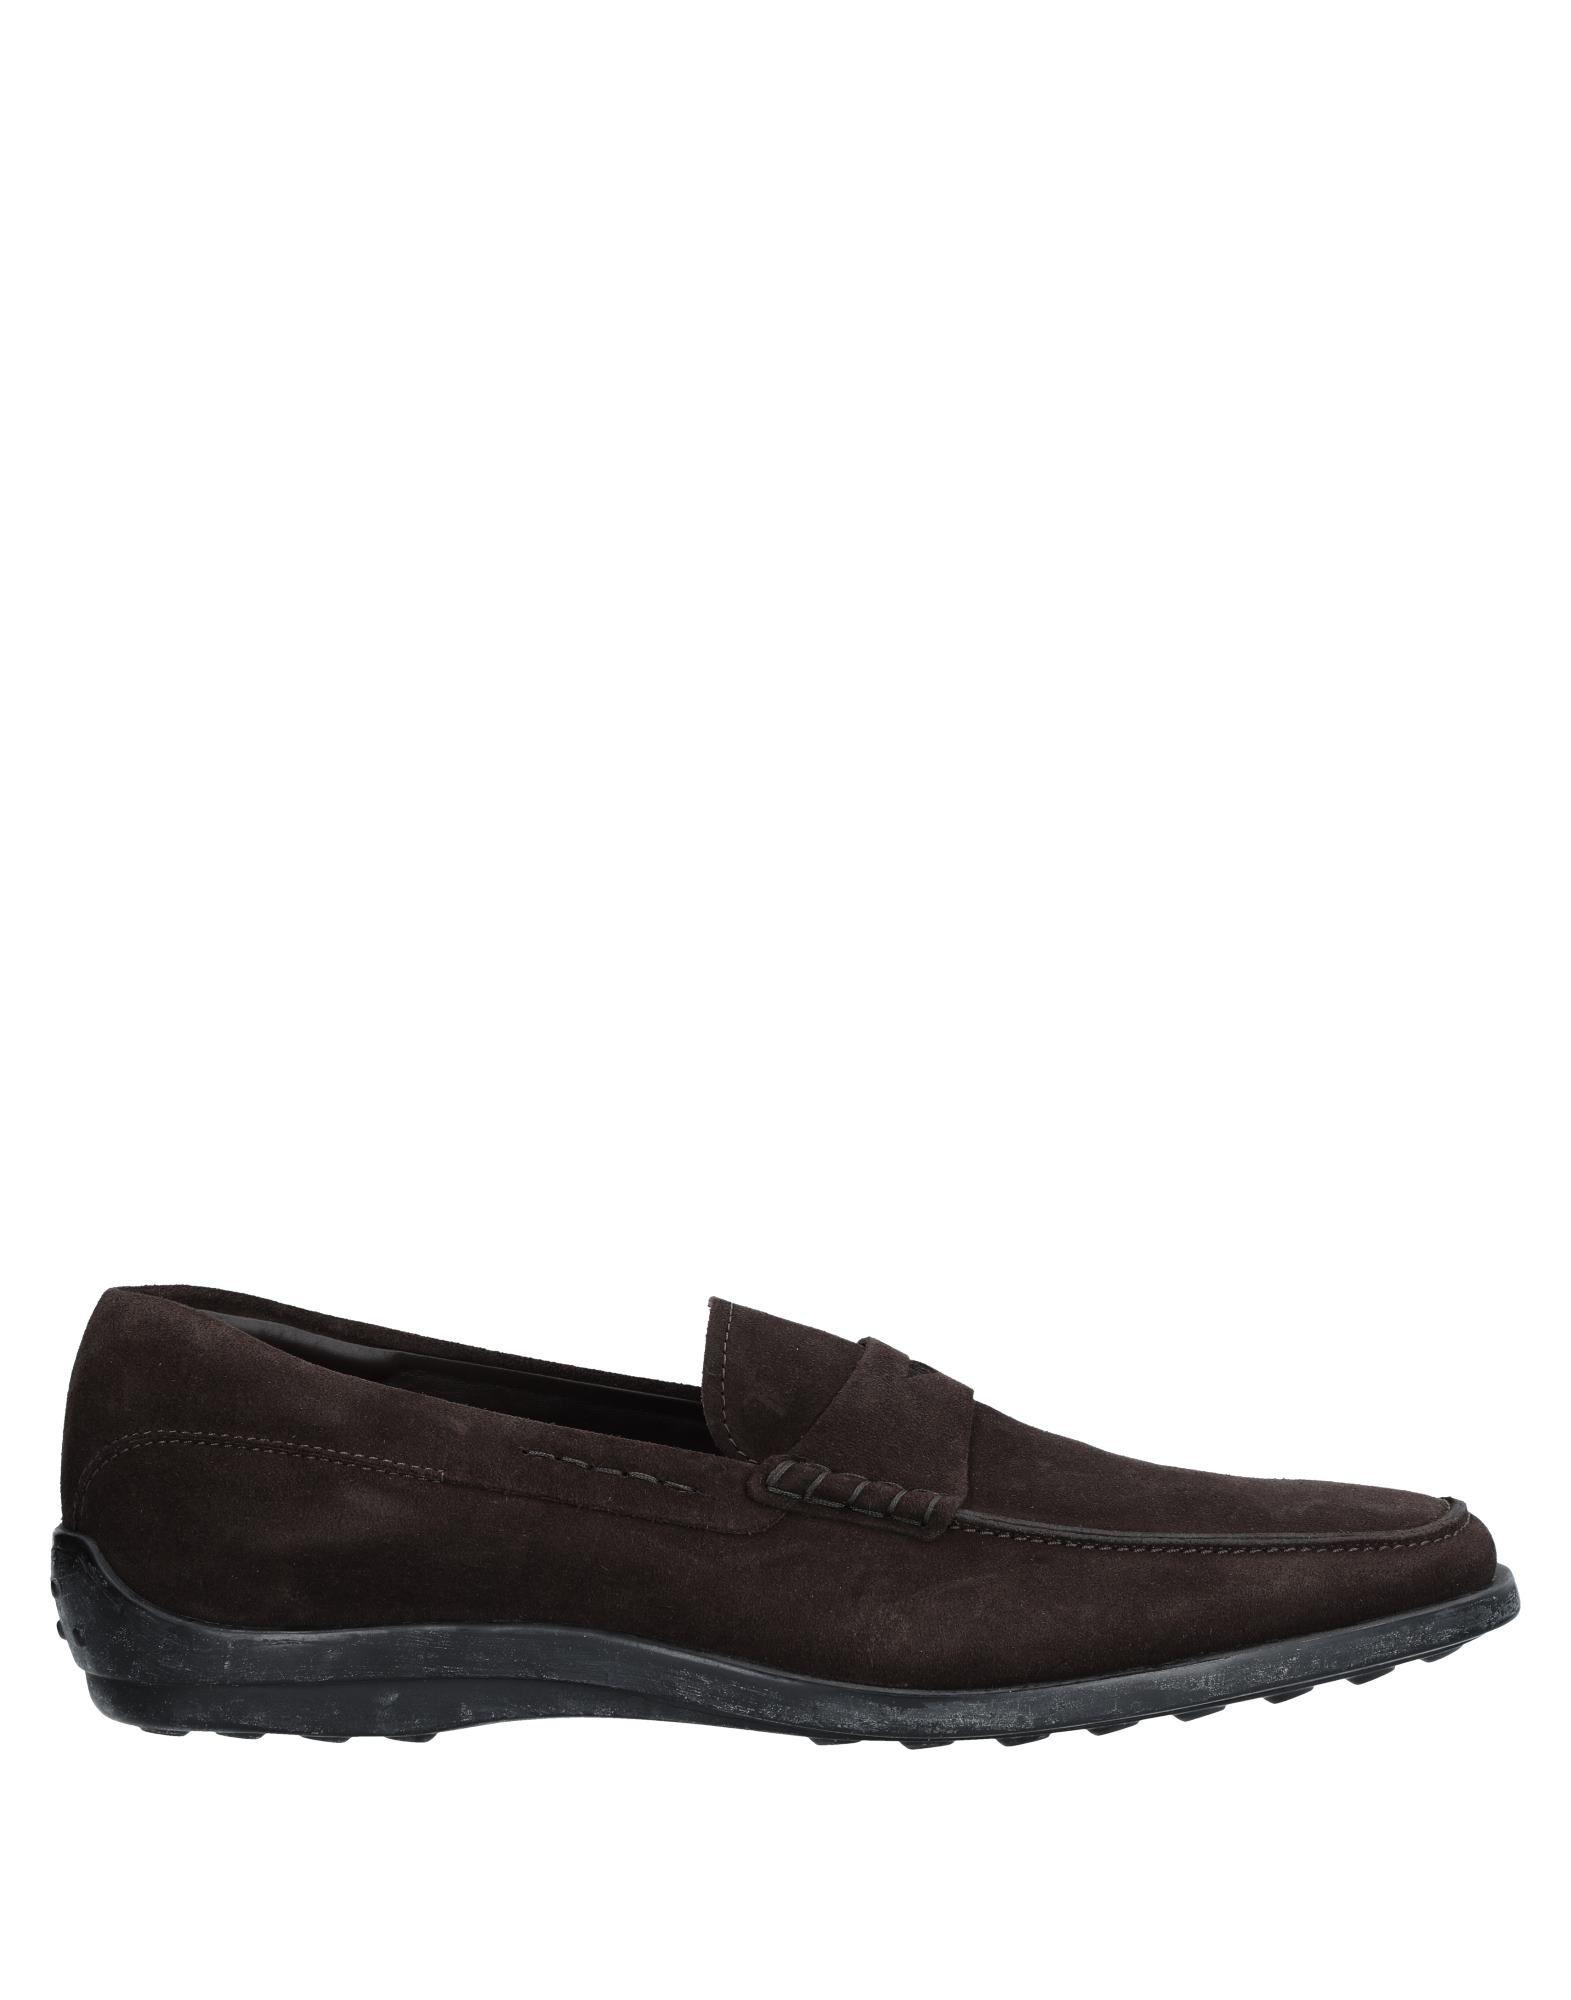 Tod's Mokassins Herren  11543255QE Gute Qualität beliebte Schuhe